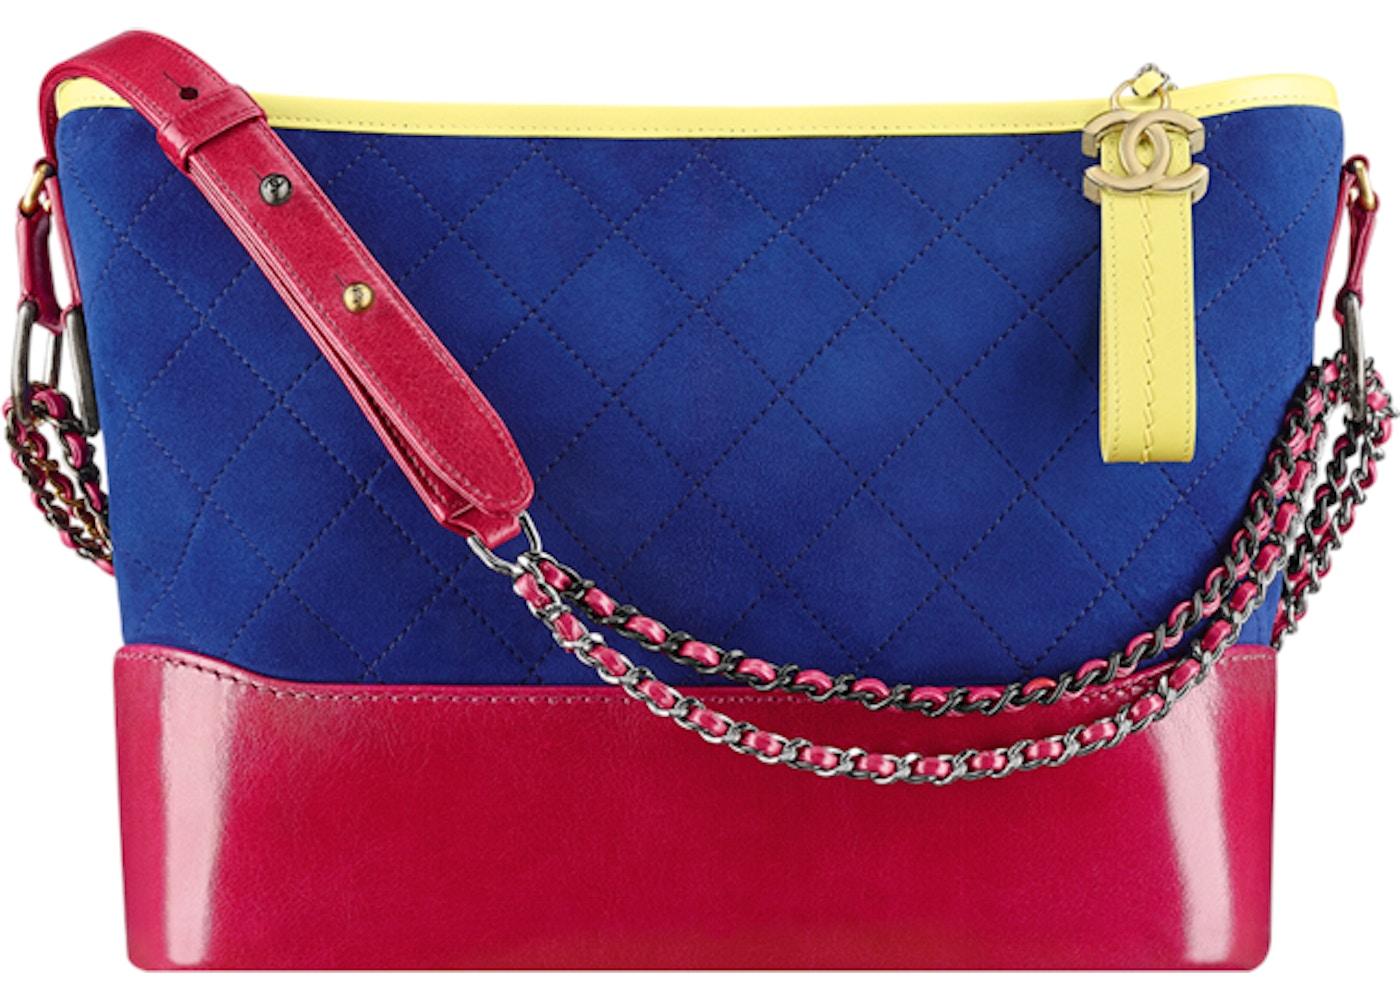 6c06ae260c3d4d Buy & Sell Chanel Handbags - New Highest Bids